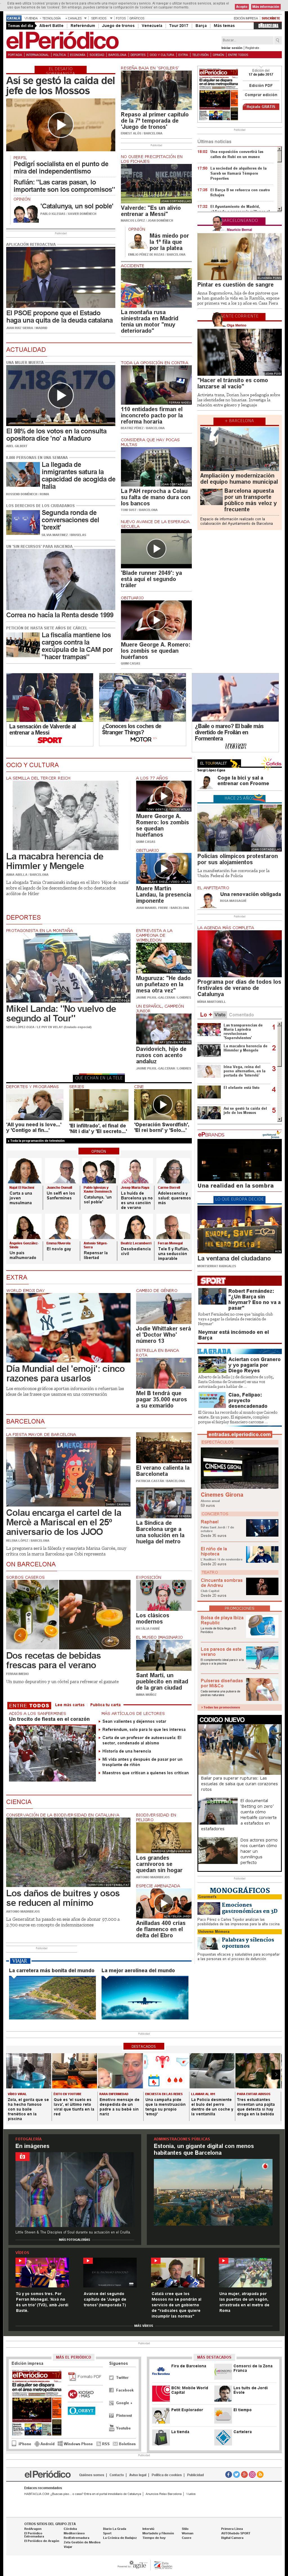 El Periodico at Monday July 17, 2017, 4:17 p.m. UTC